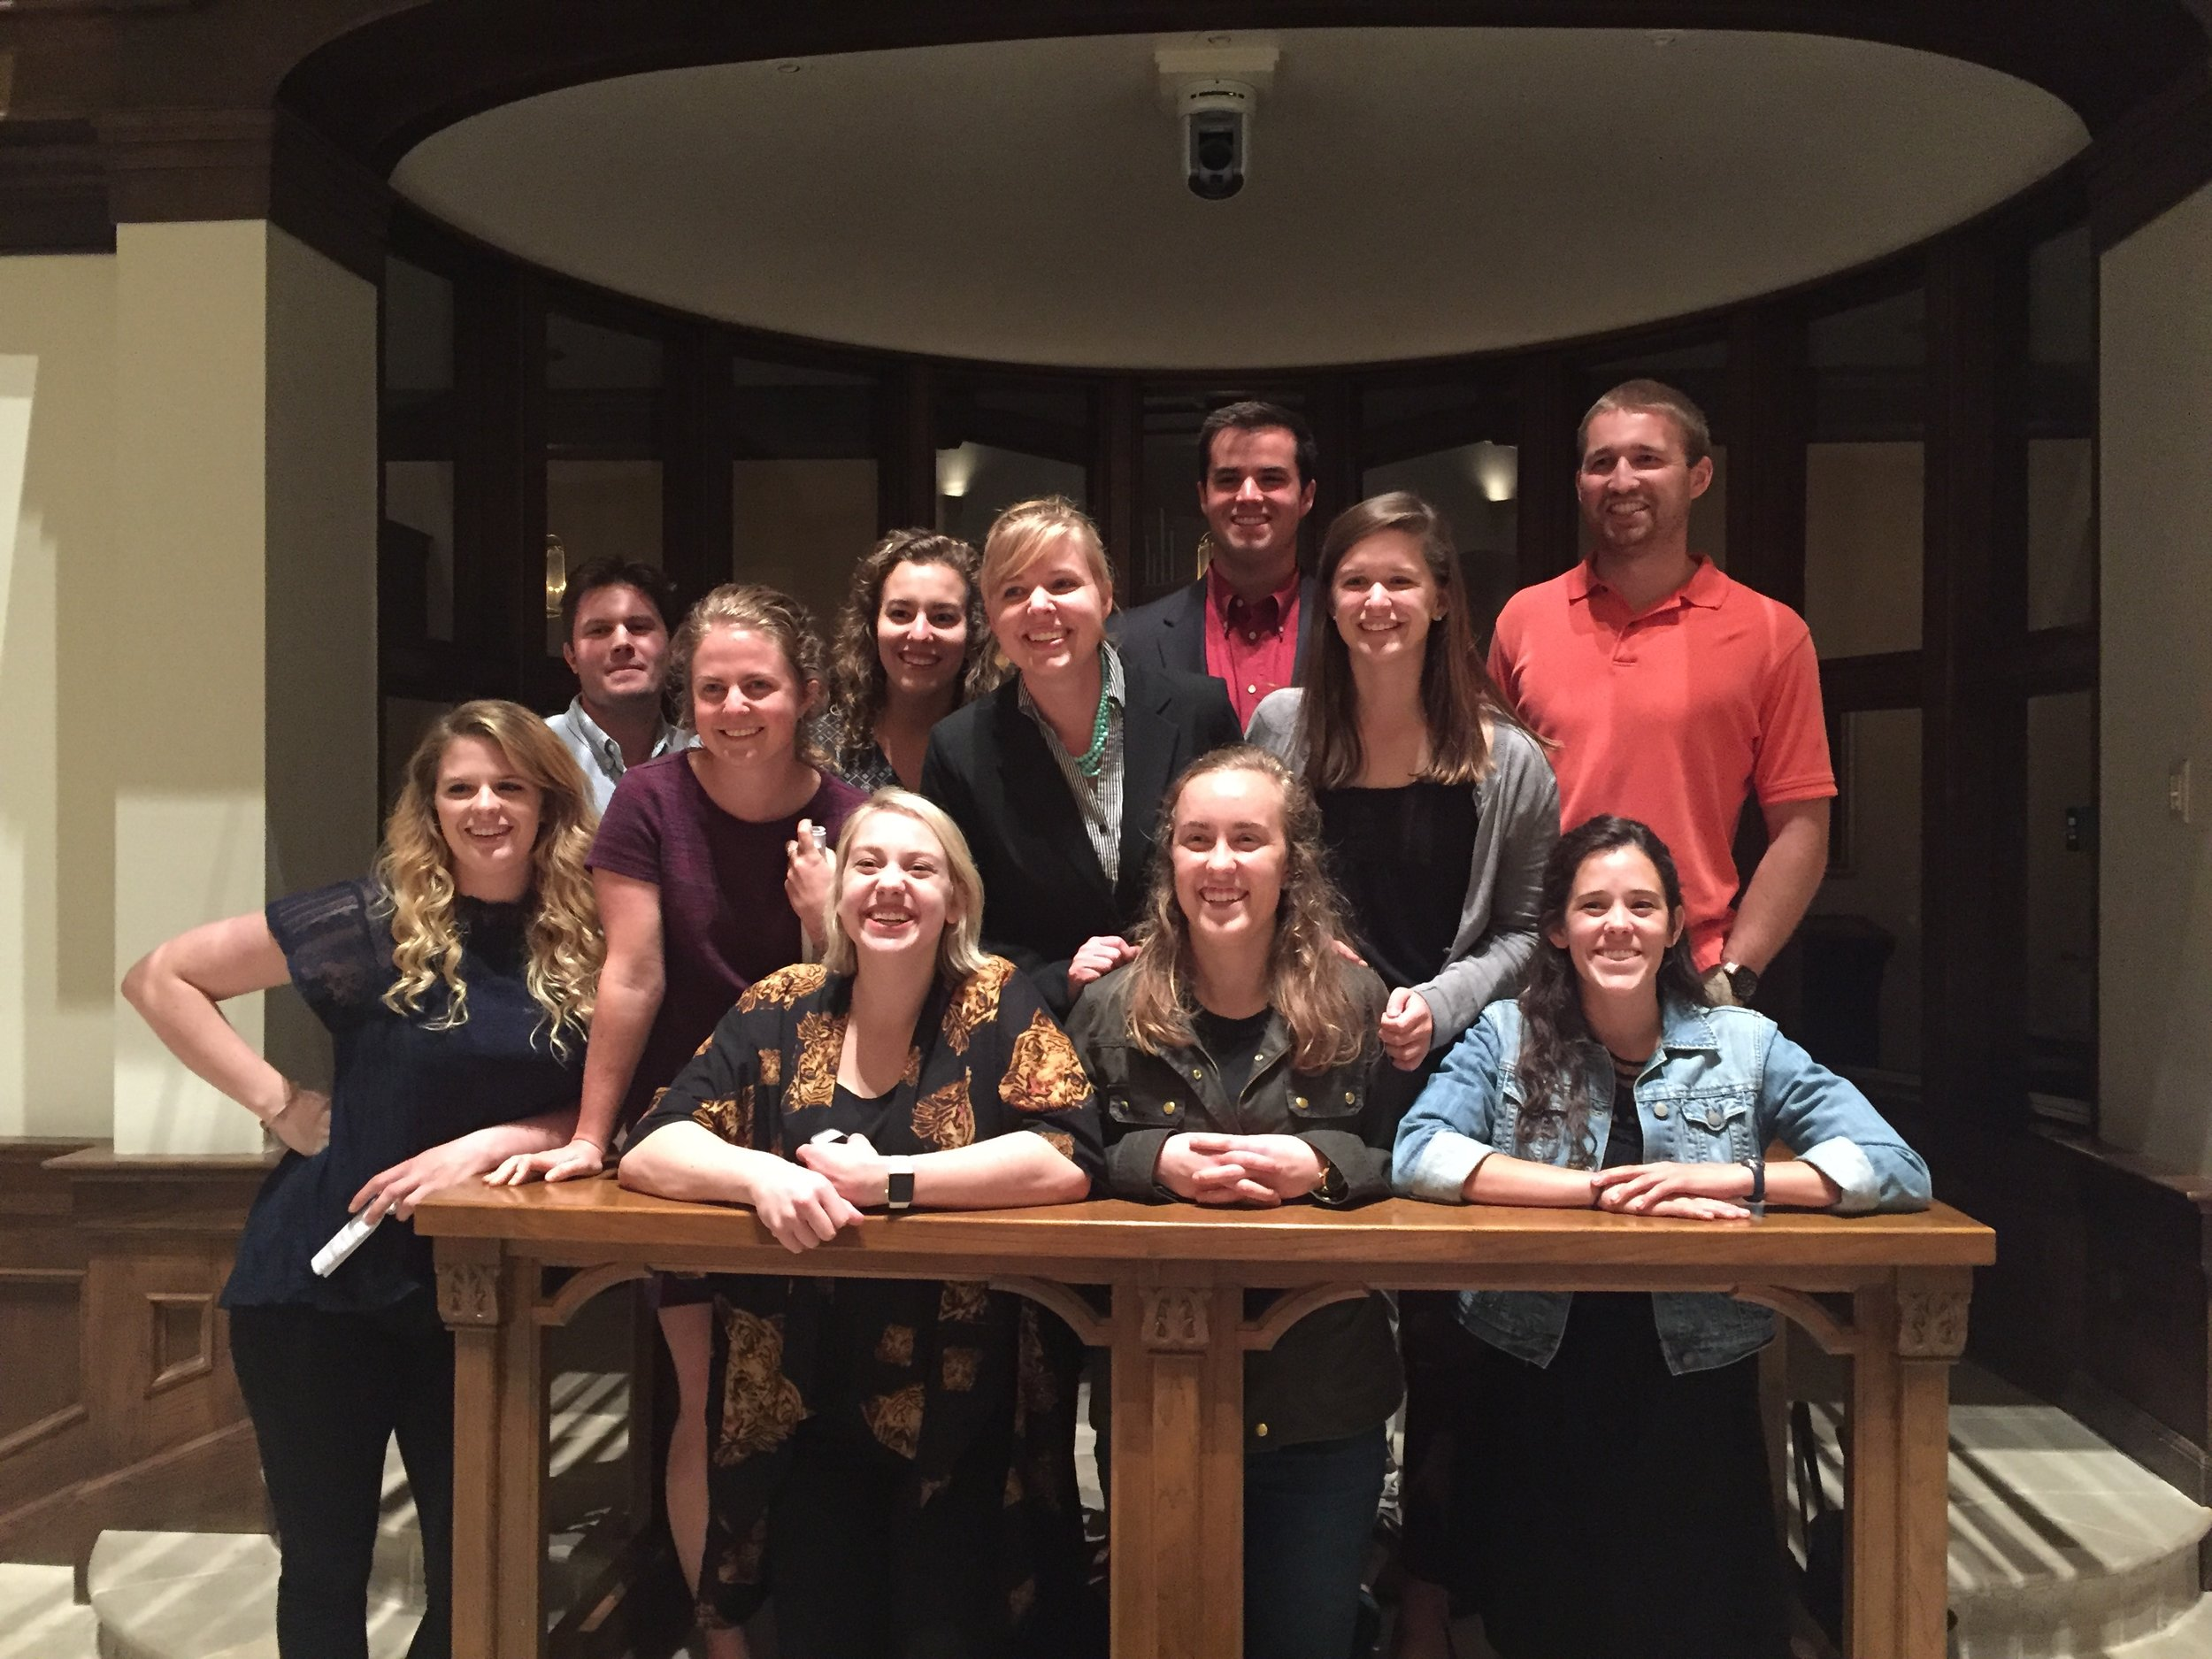 Nashville Fellows at St. George's Episcopal Church's Maundy Thursday service